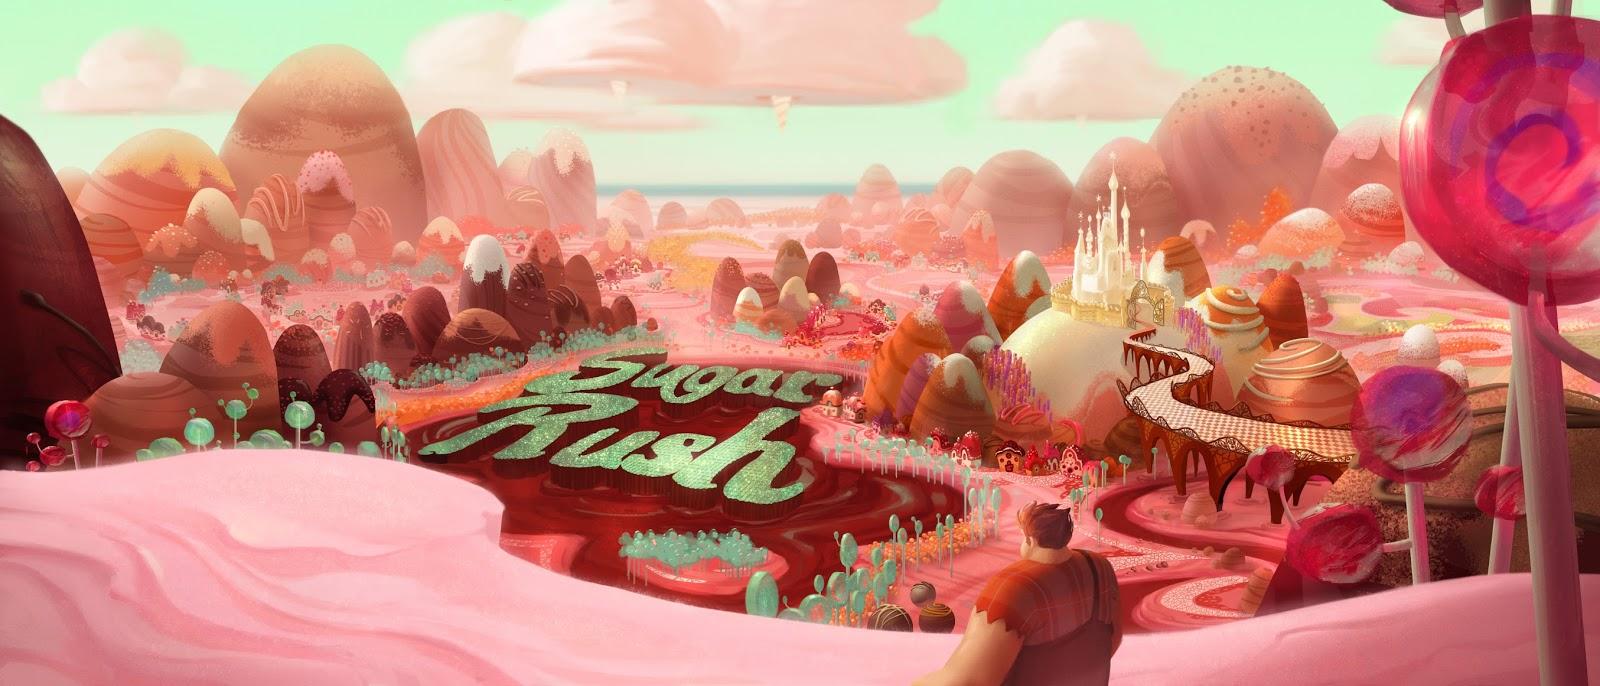 Sugar Rush, from  Wreck-It Ralph  (9:42)